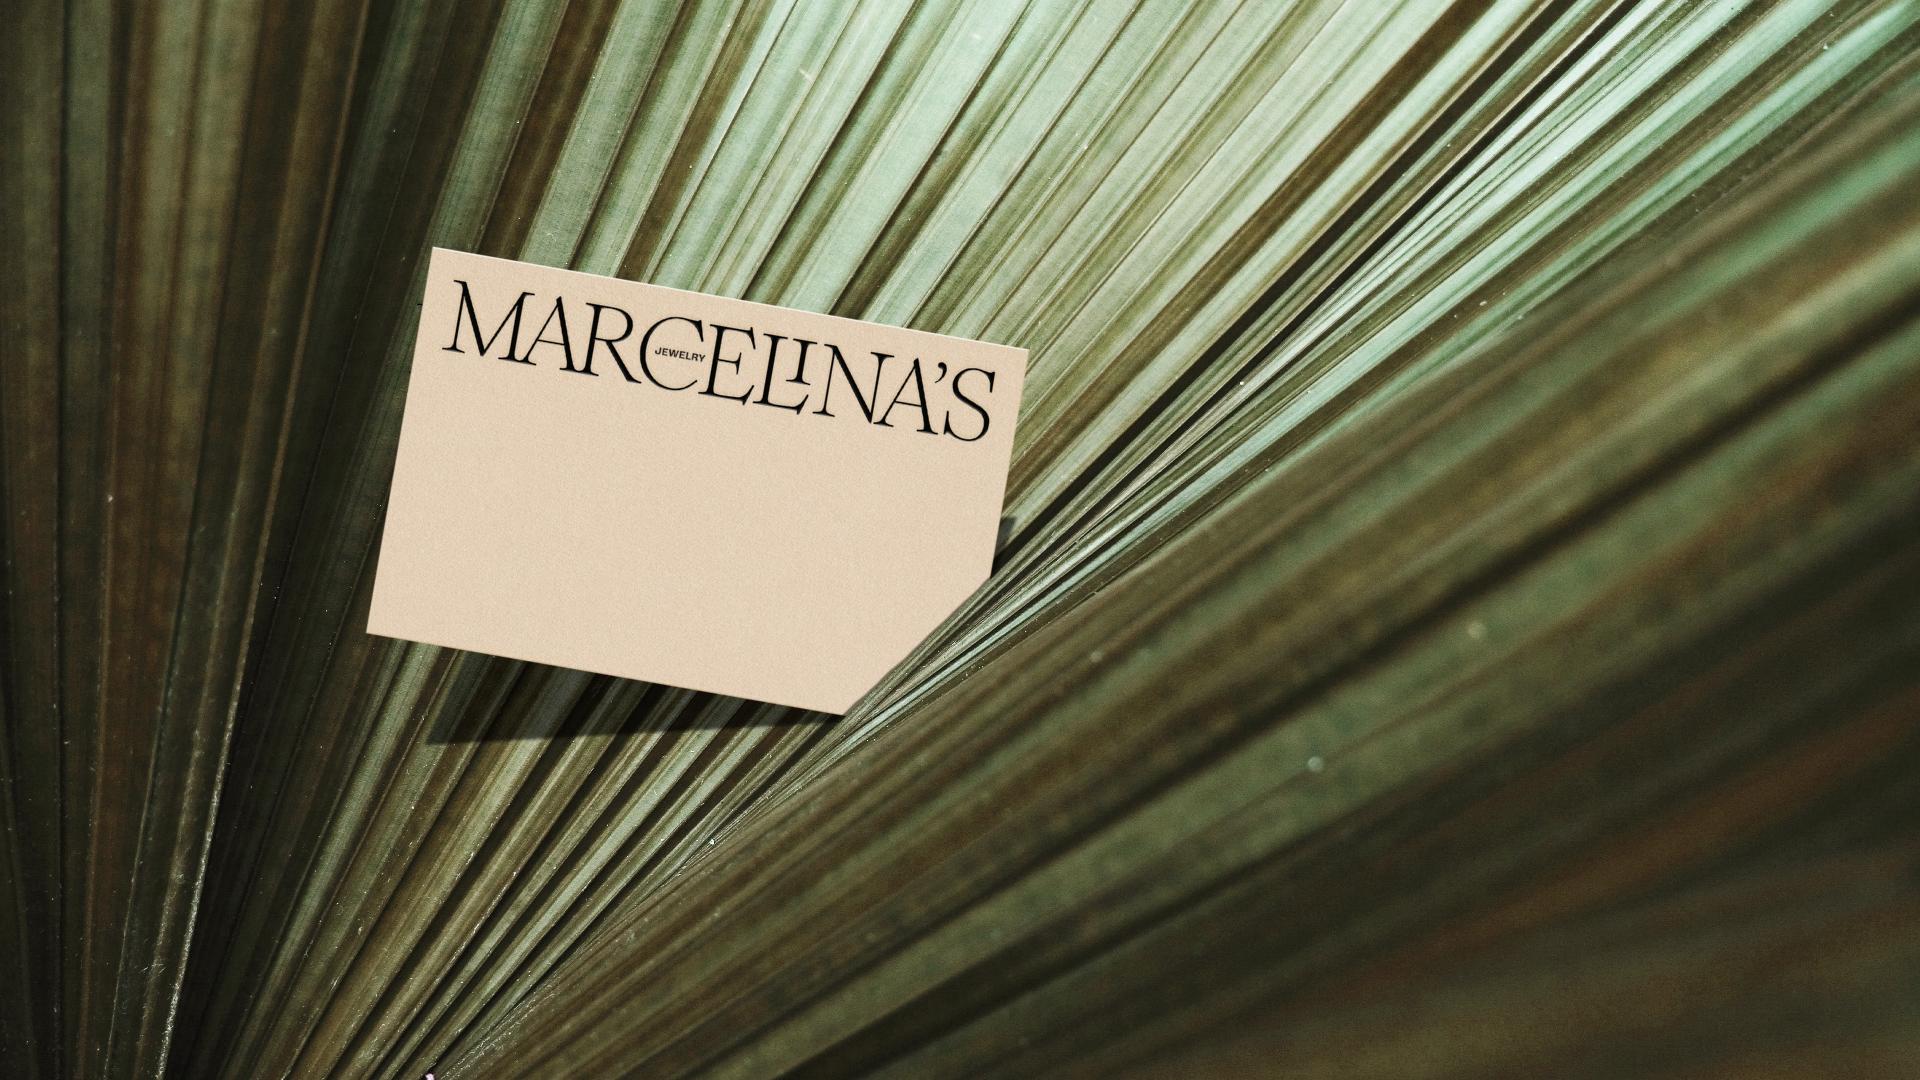 Marcelina's Jewelry Brand Identity Design